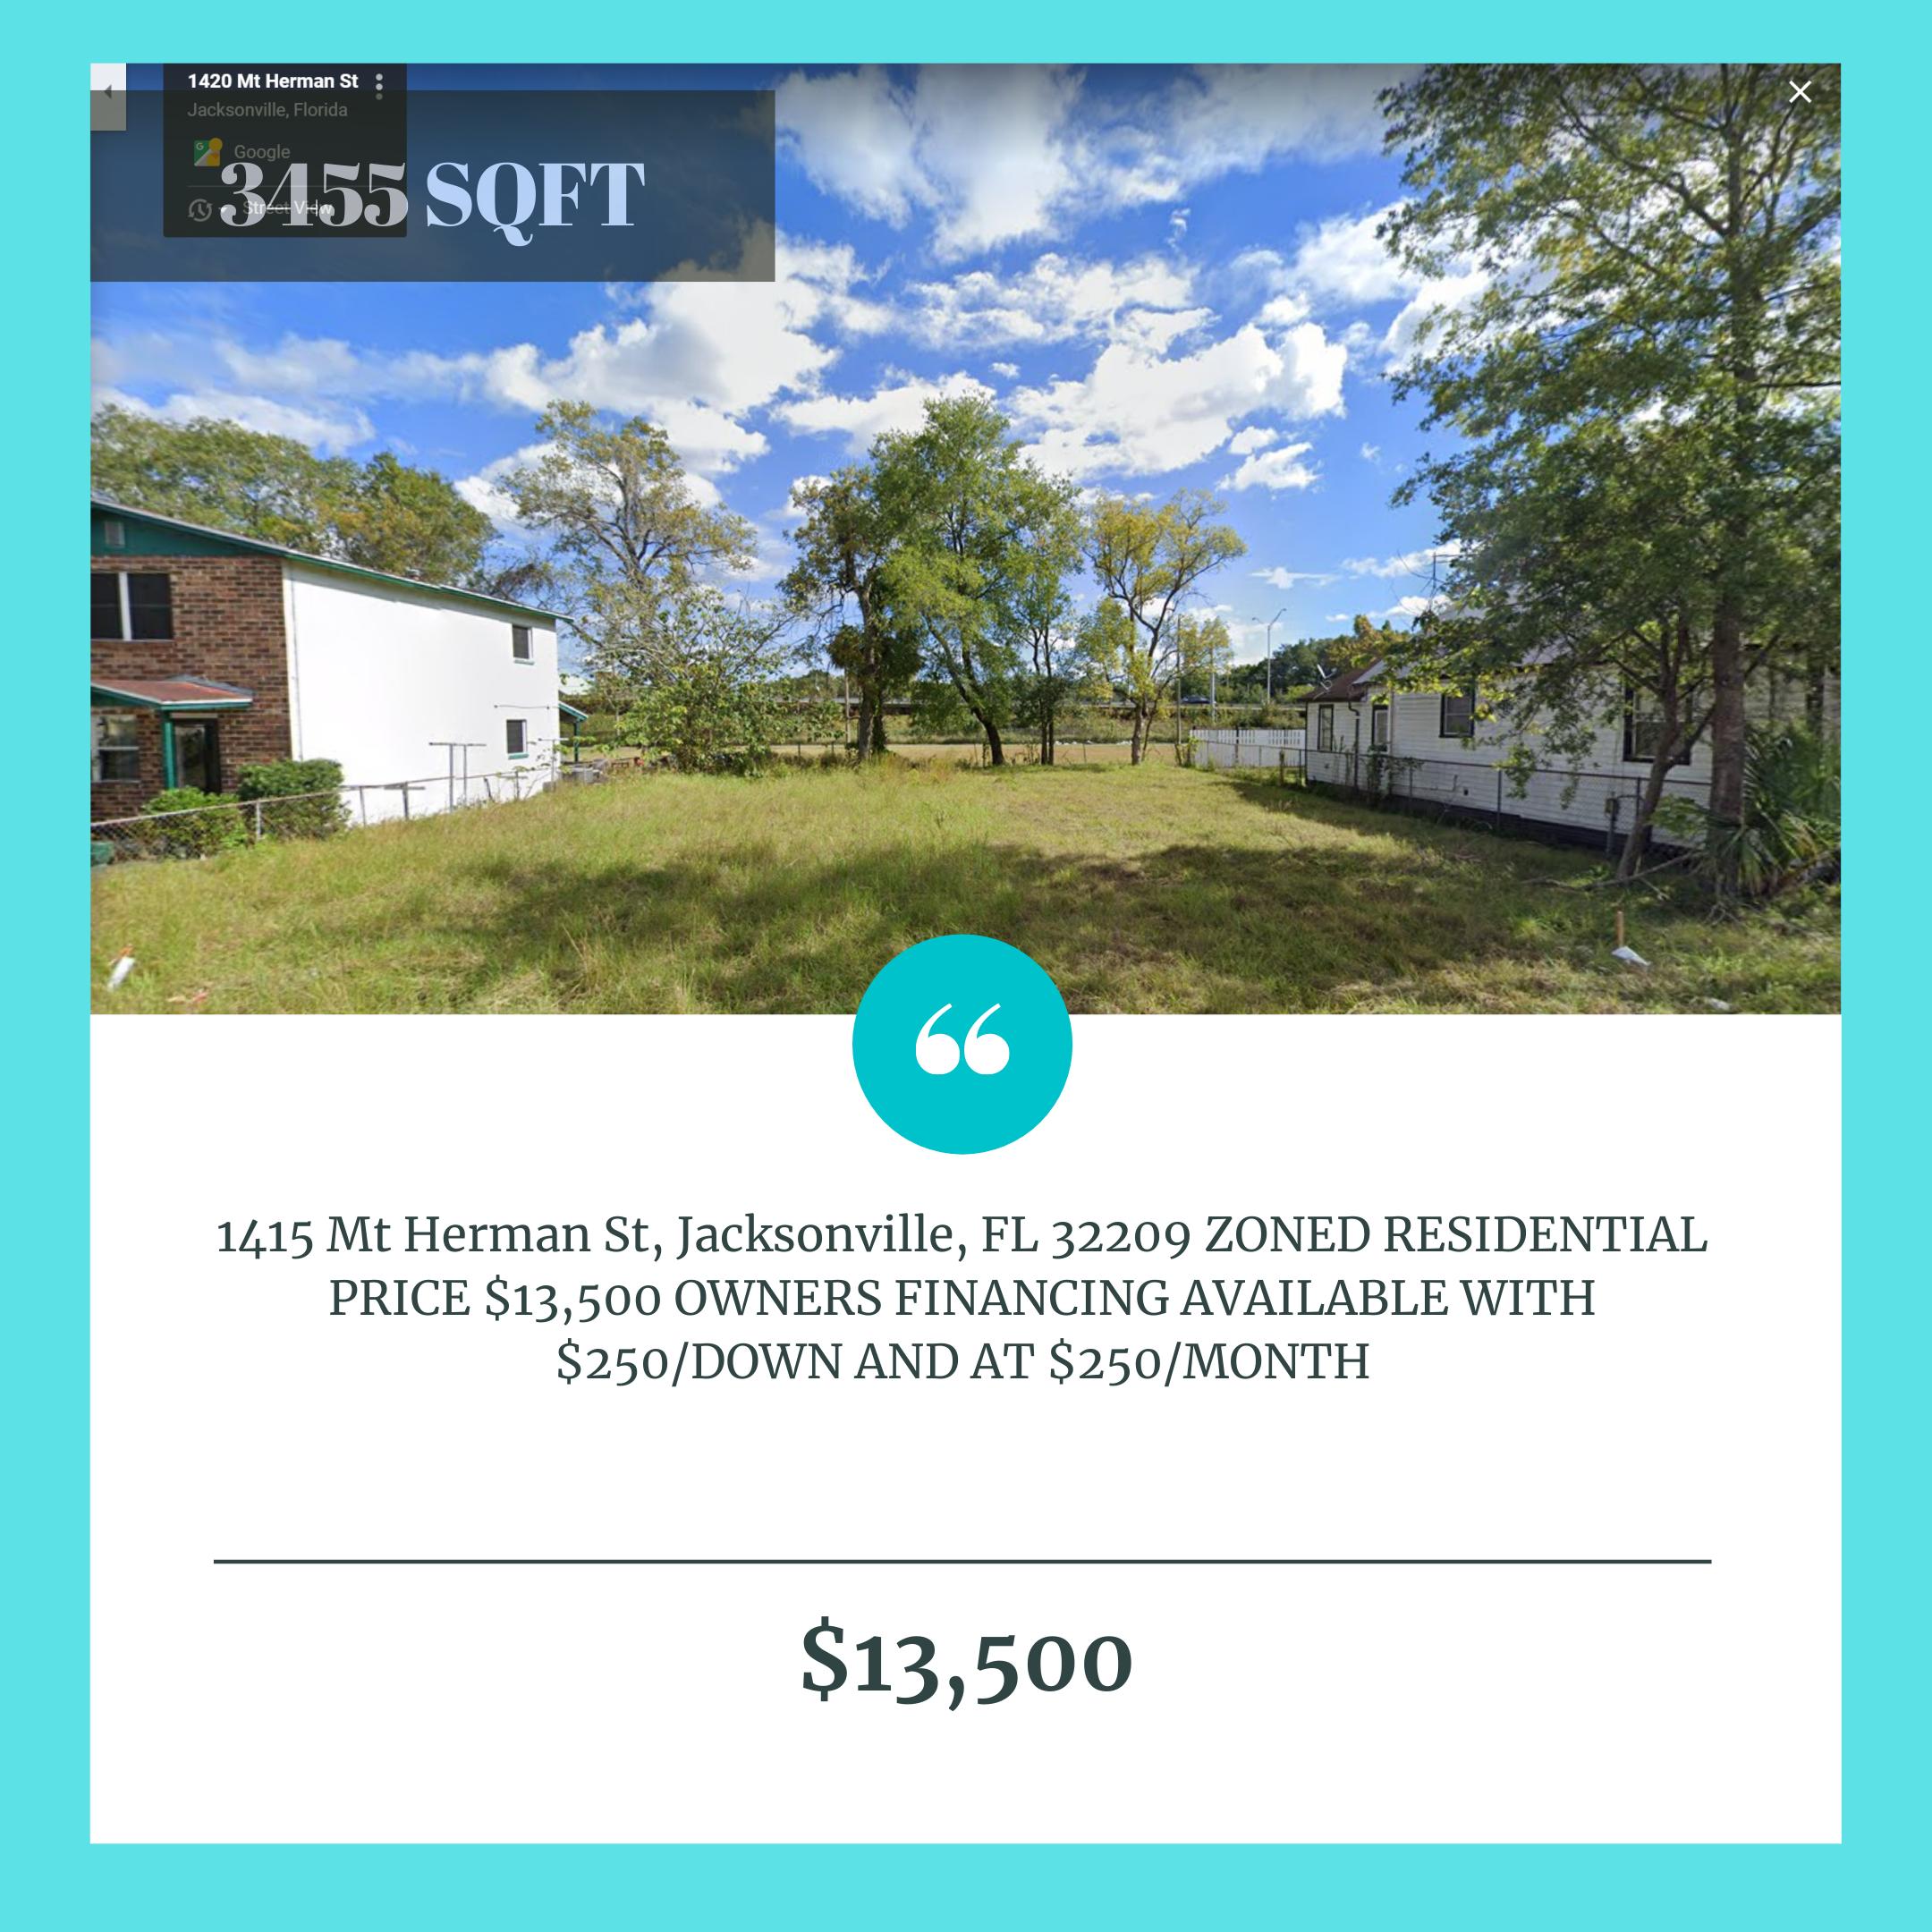 1415 Mt Herman St, Jacksonville FL 32209